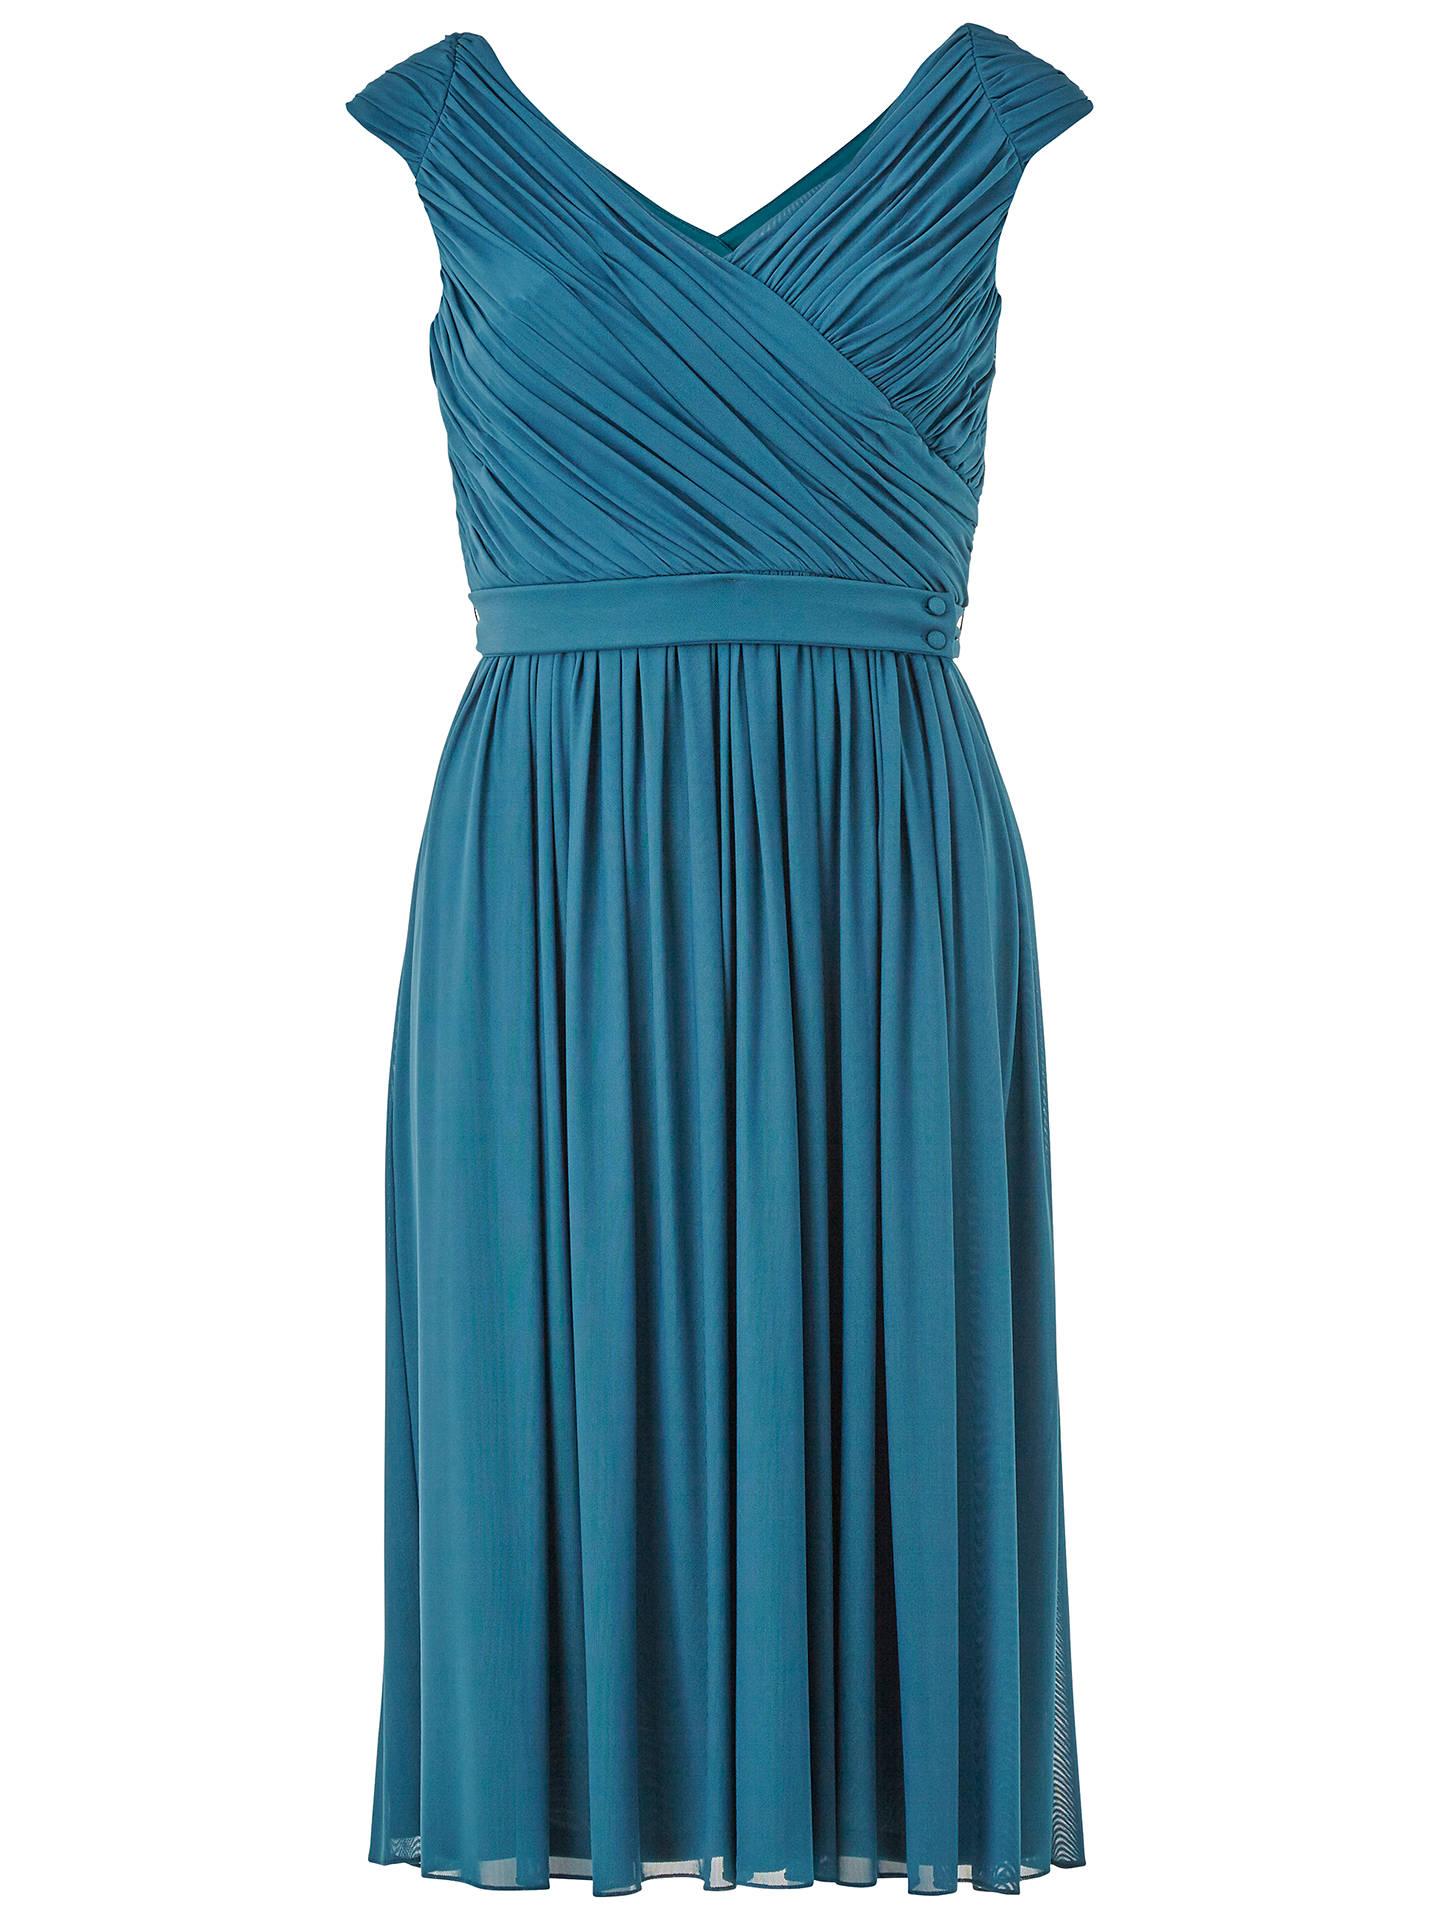 V-Neck Pleated Bodice Dress